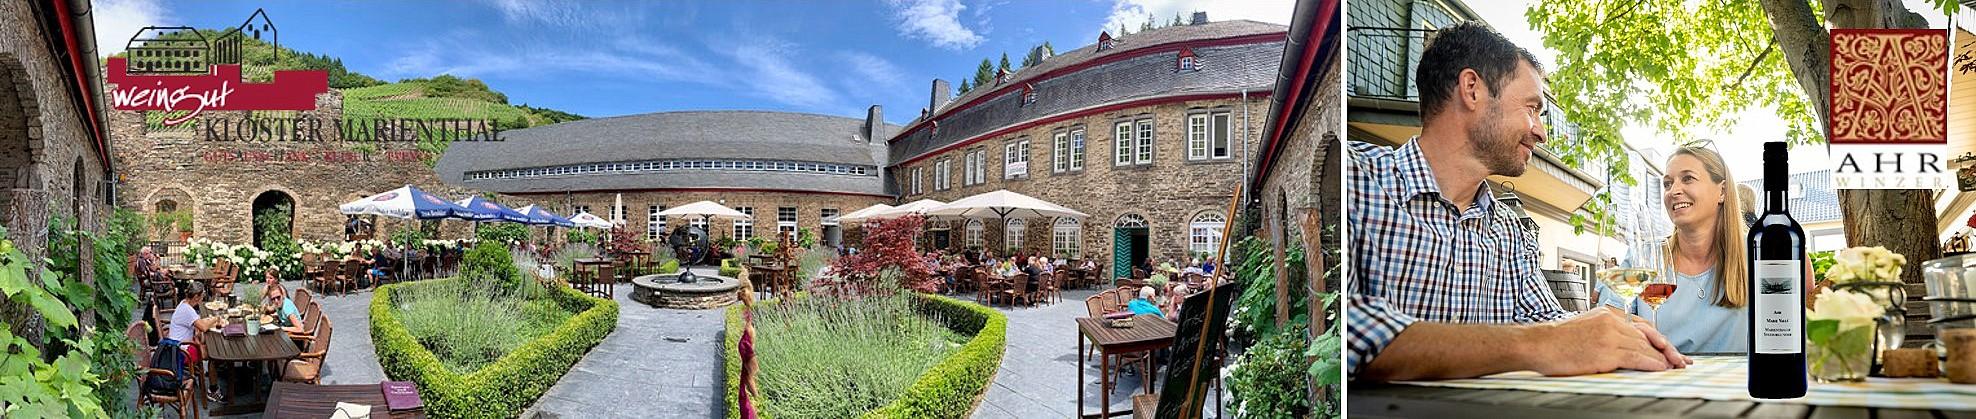 Kloster-Marienthal-Marie-Vall-Ahr